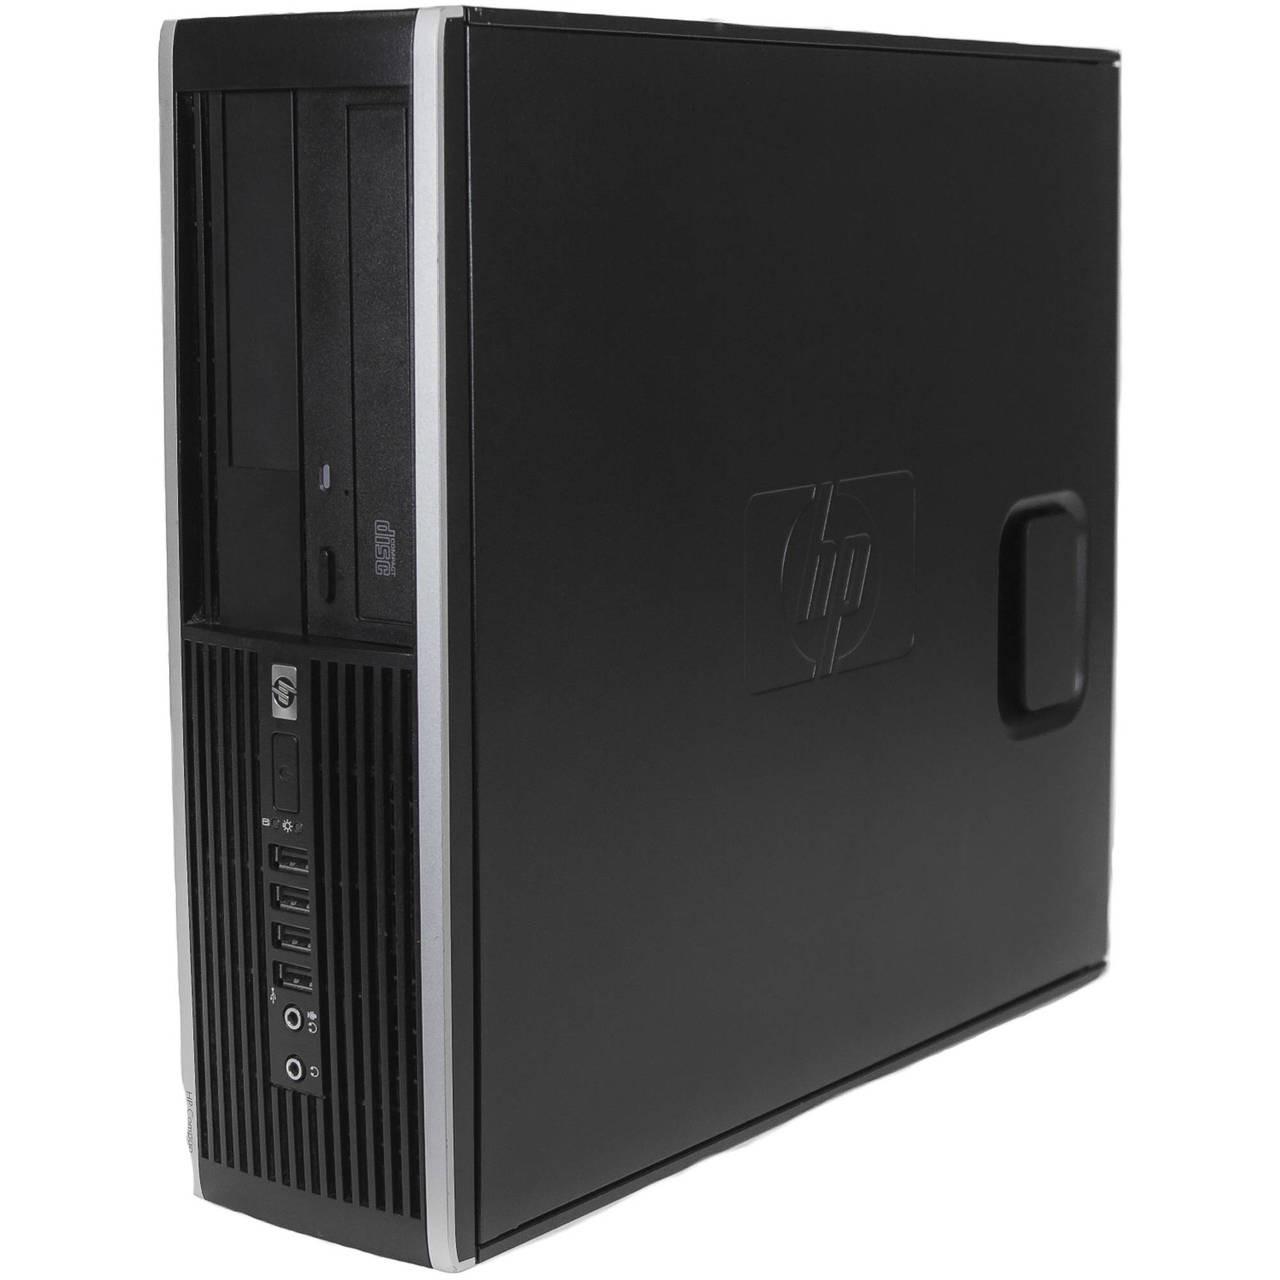 HP Compaq Elite 8100 SFF - Front Display 2